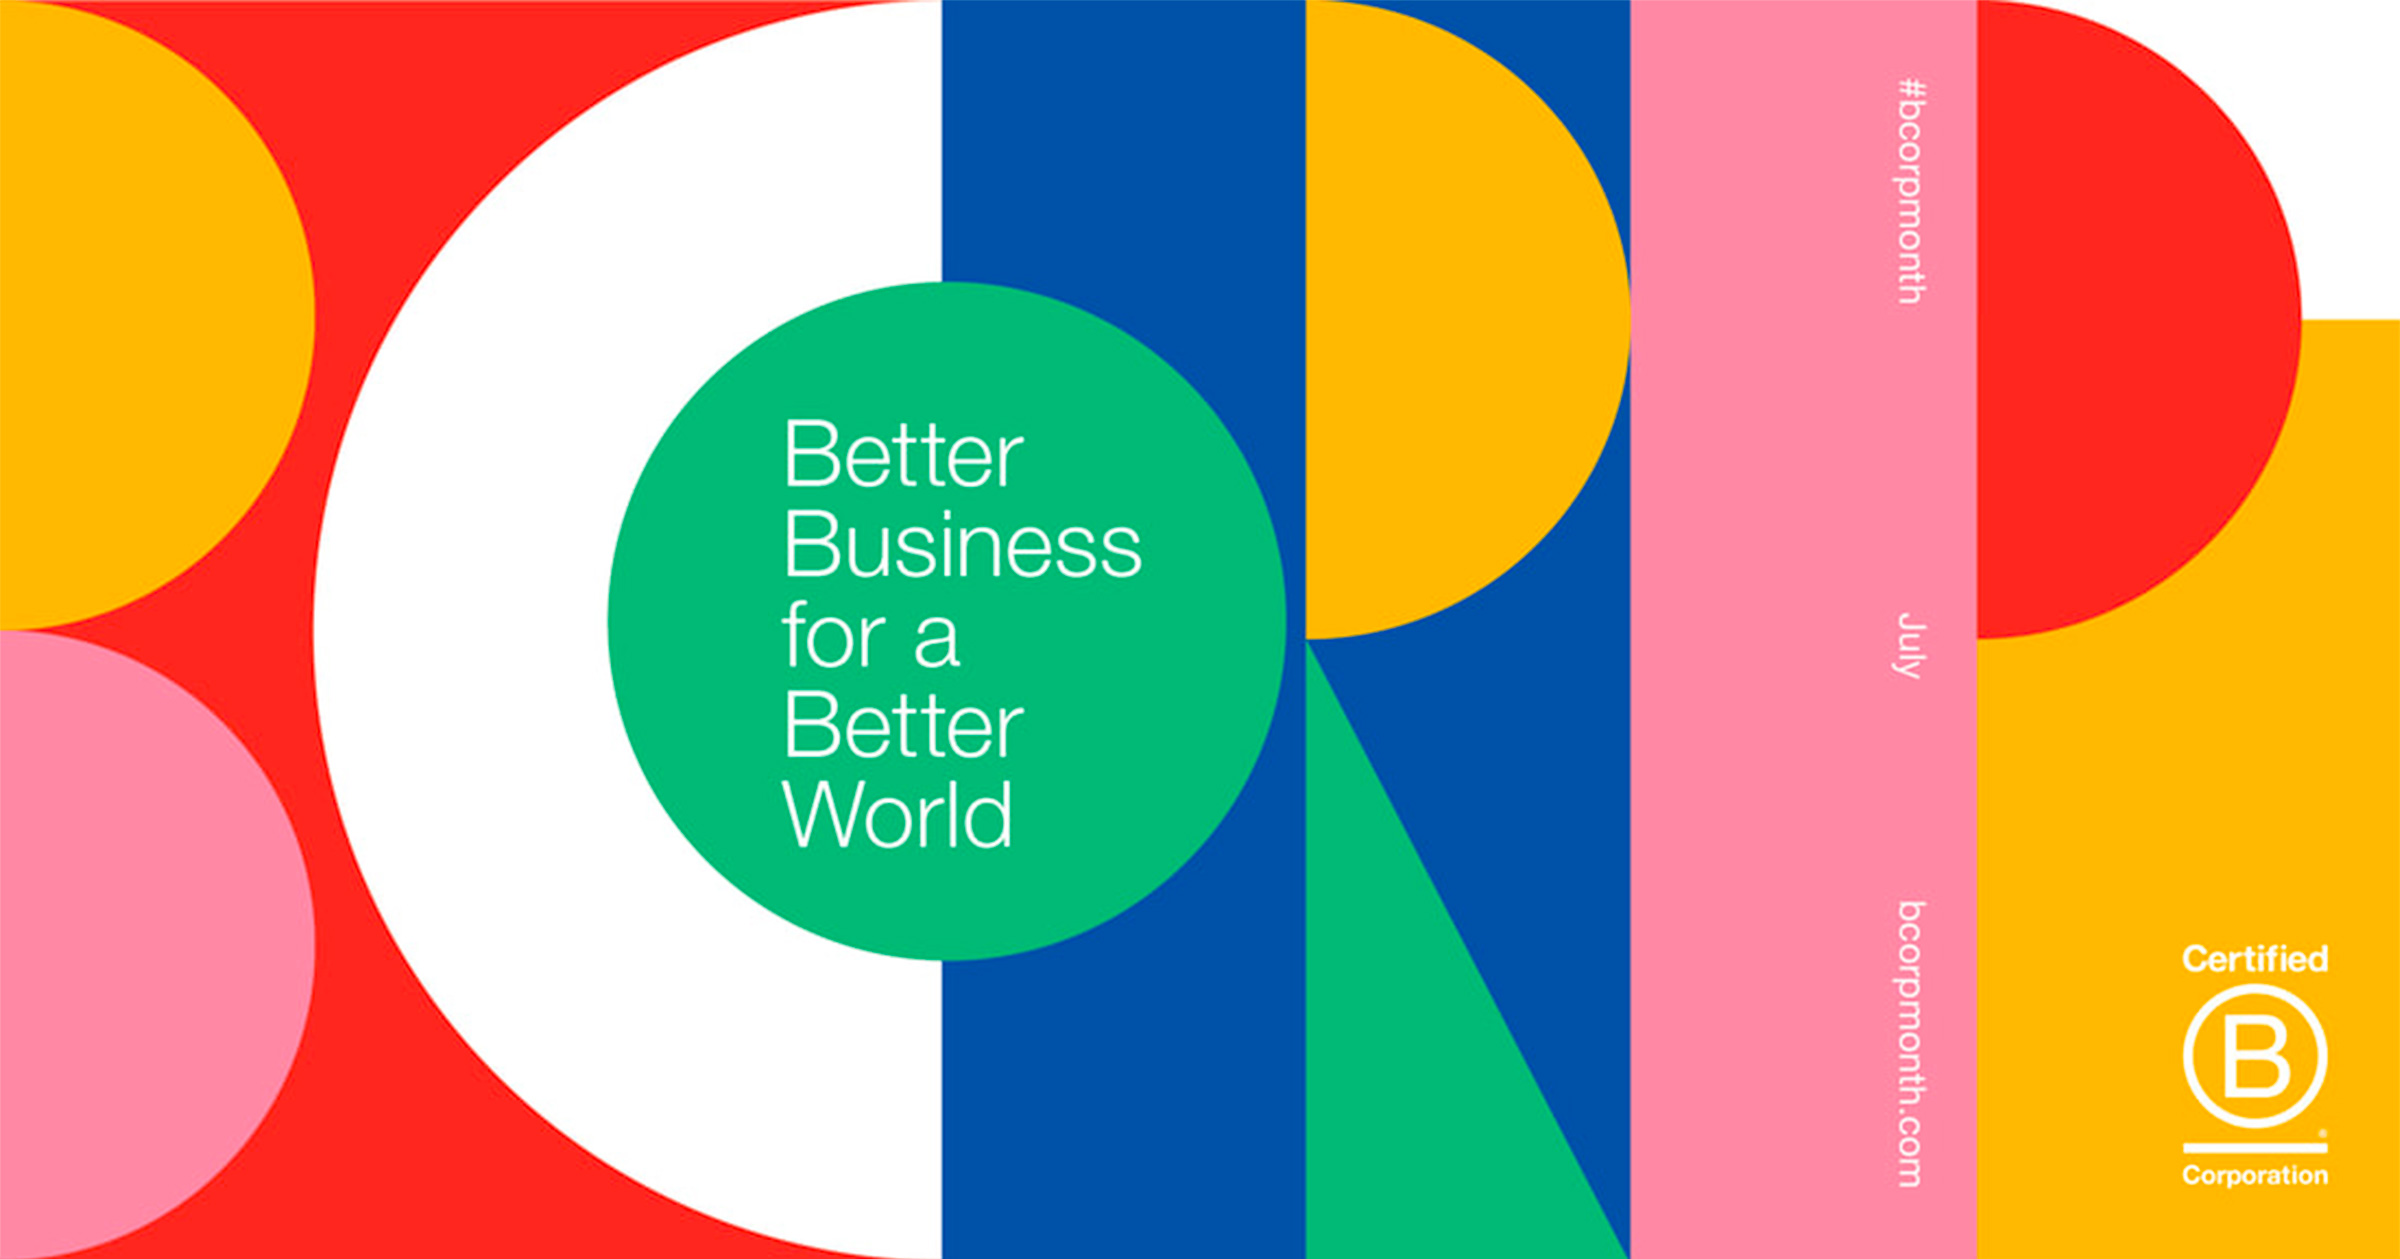 B Corp logos